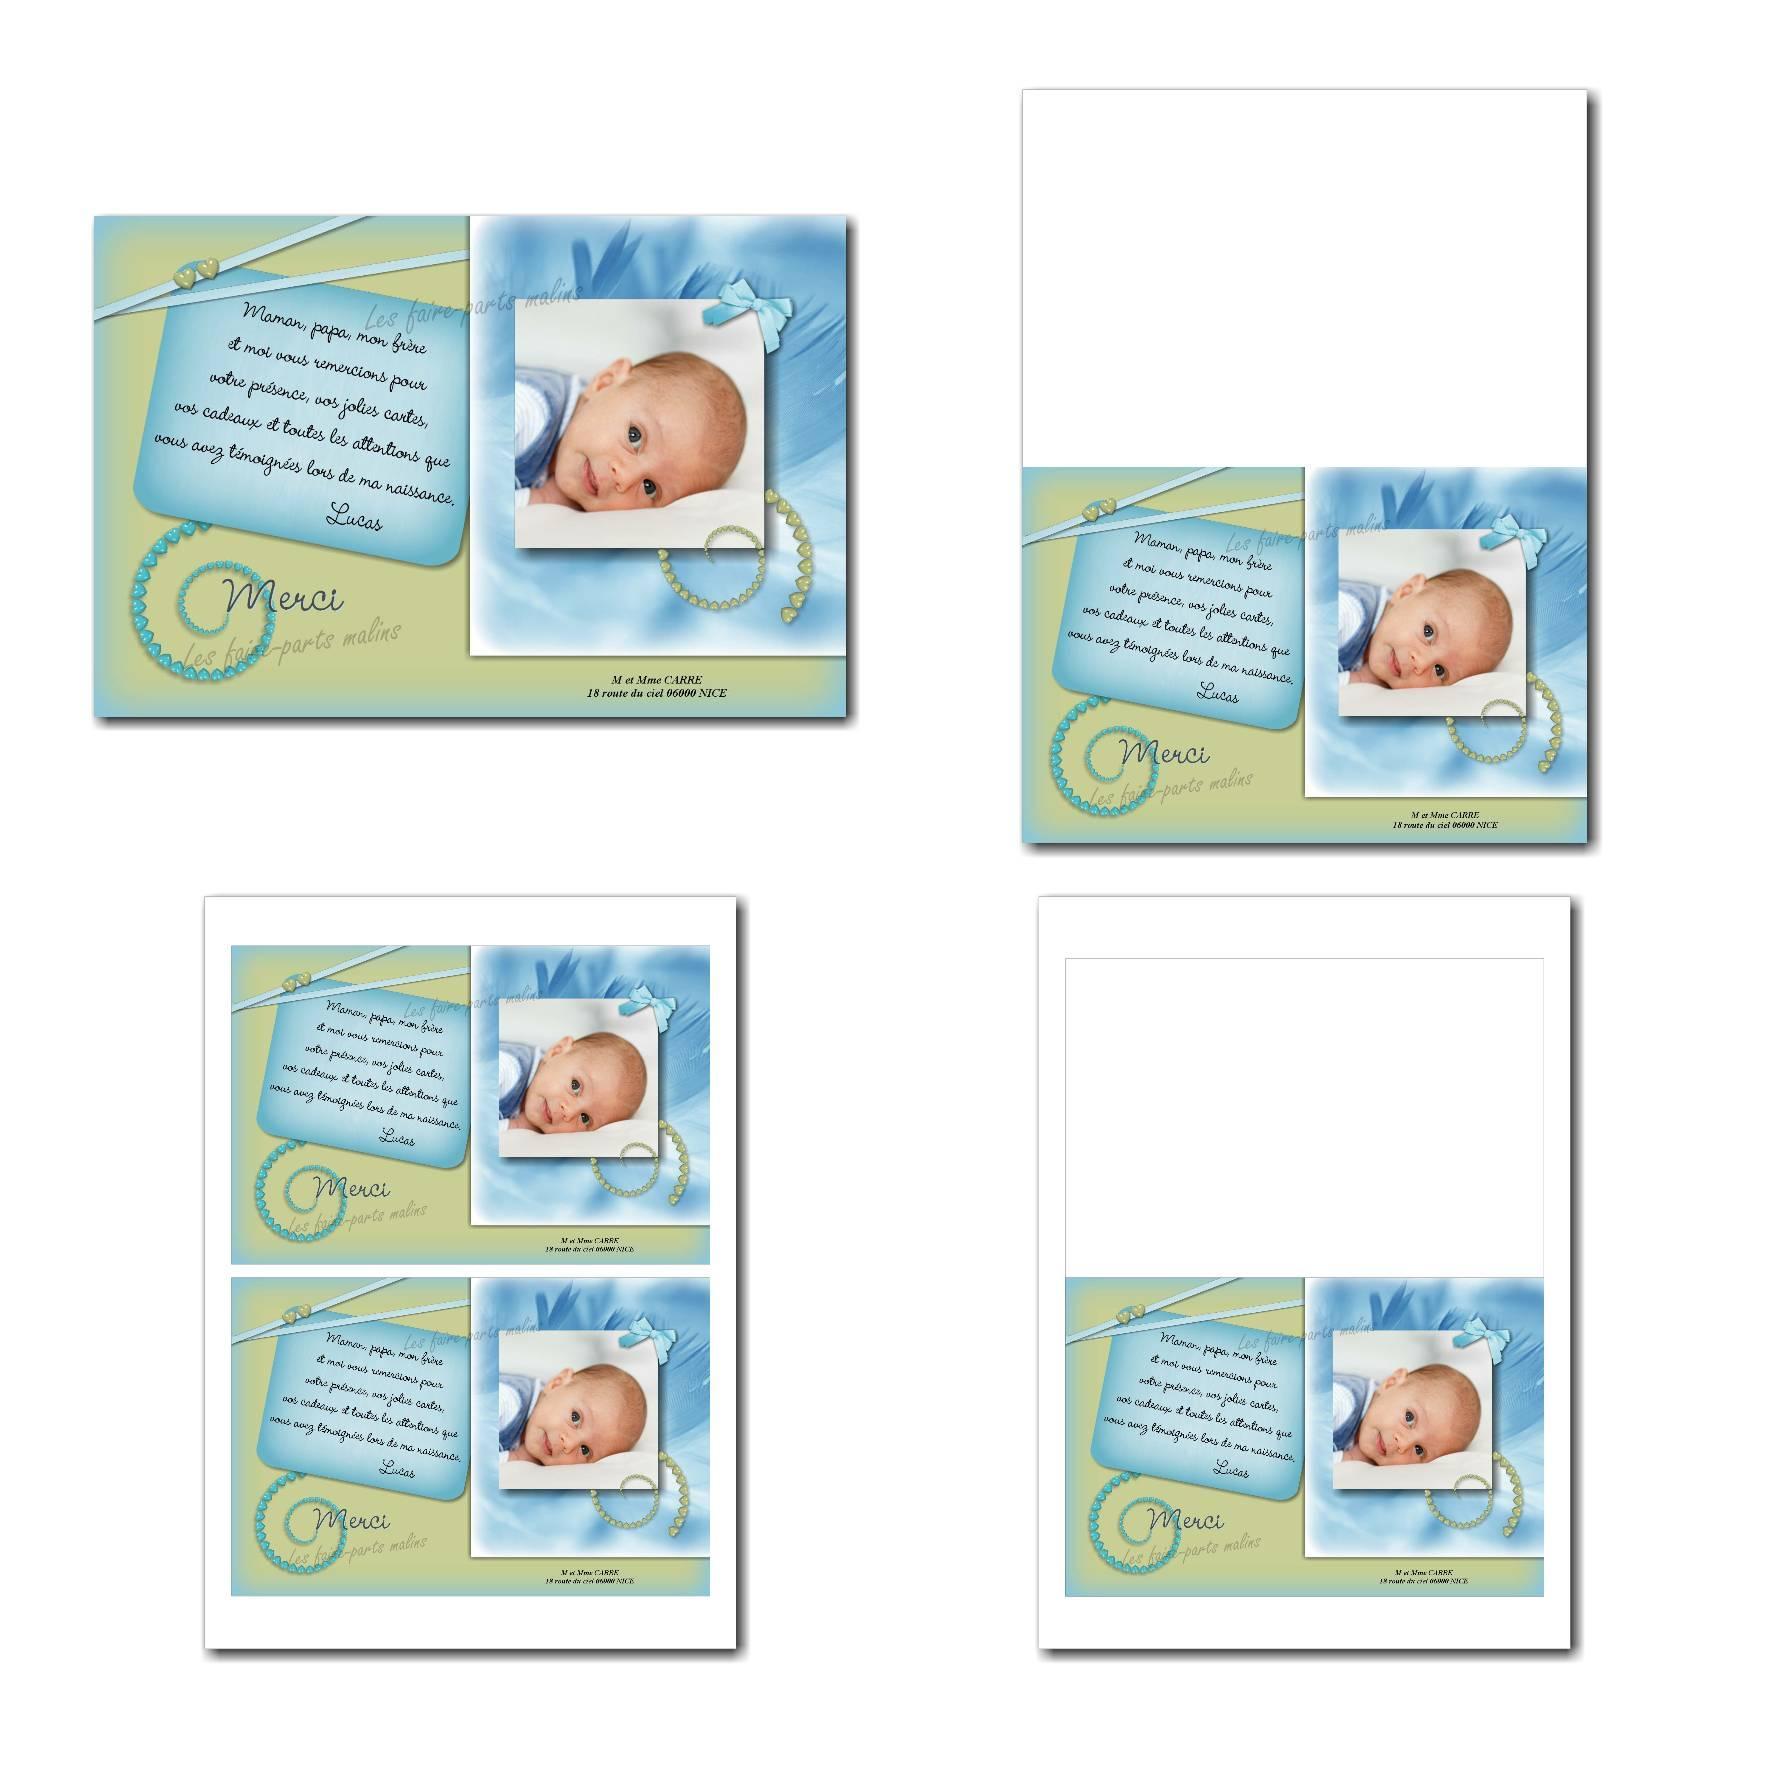 Carte de remerciements à imprimer bleu et vert avec petits coeurs